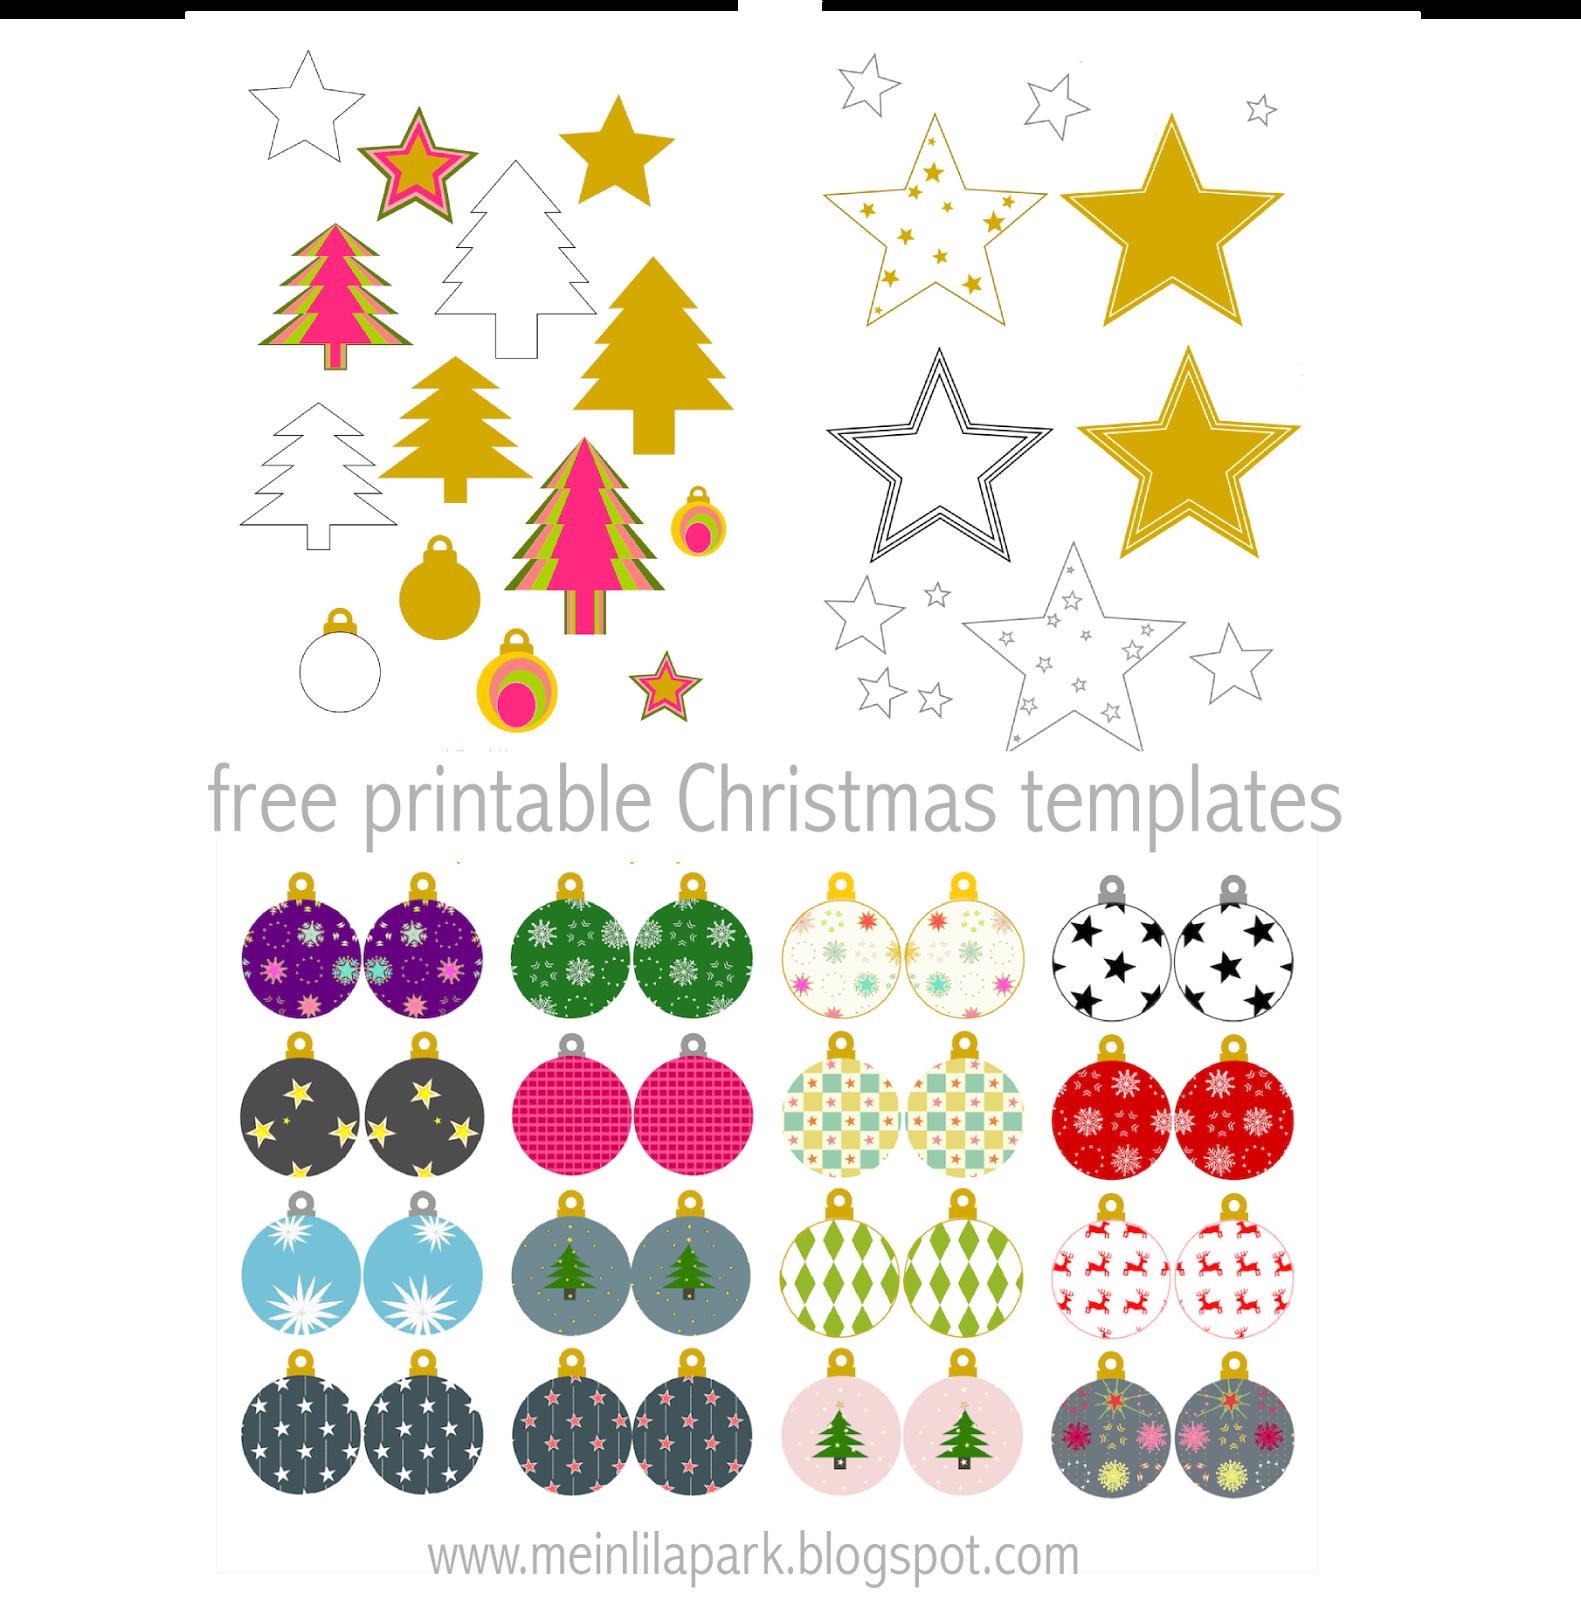 free printable christmas templates weihnachten diy. Black Bedroom Furniture Sets. Home Design Ideas